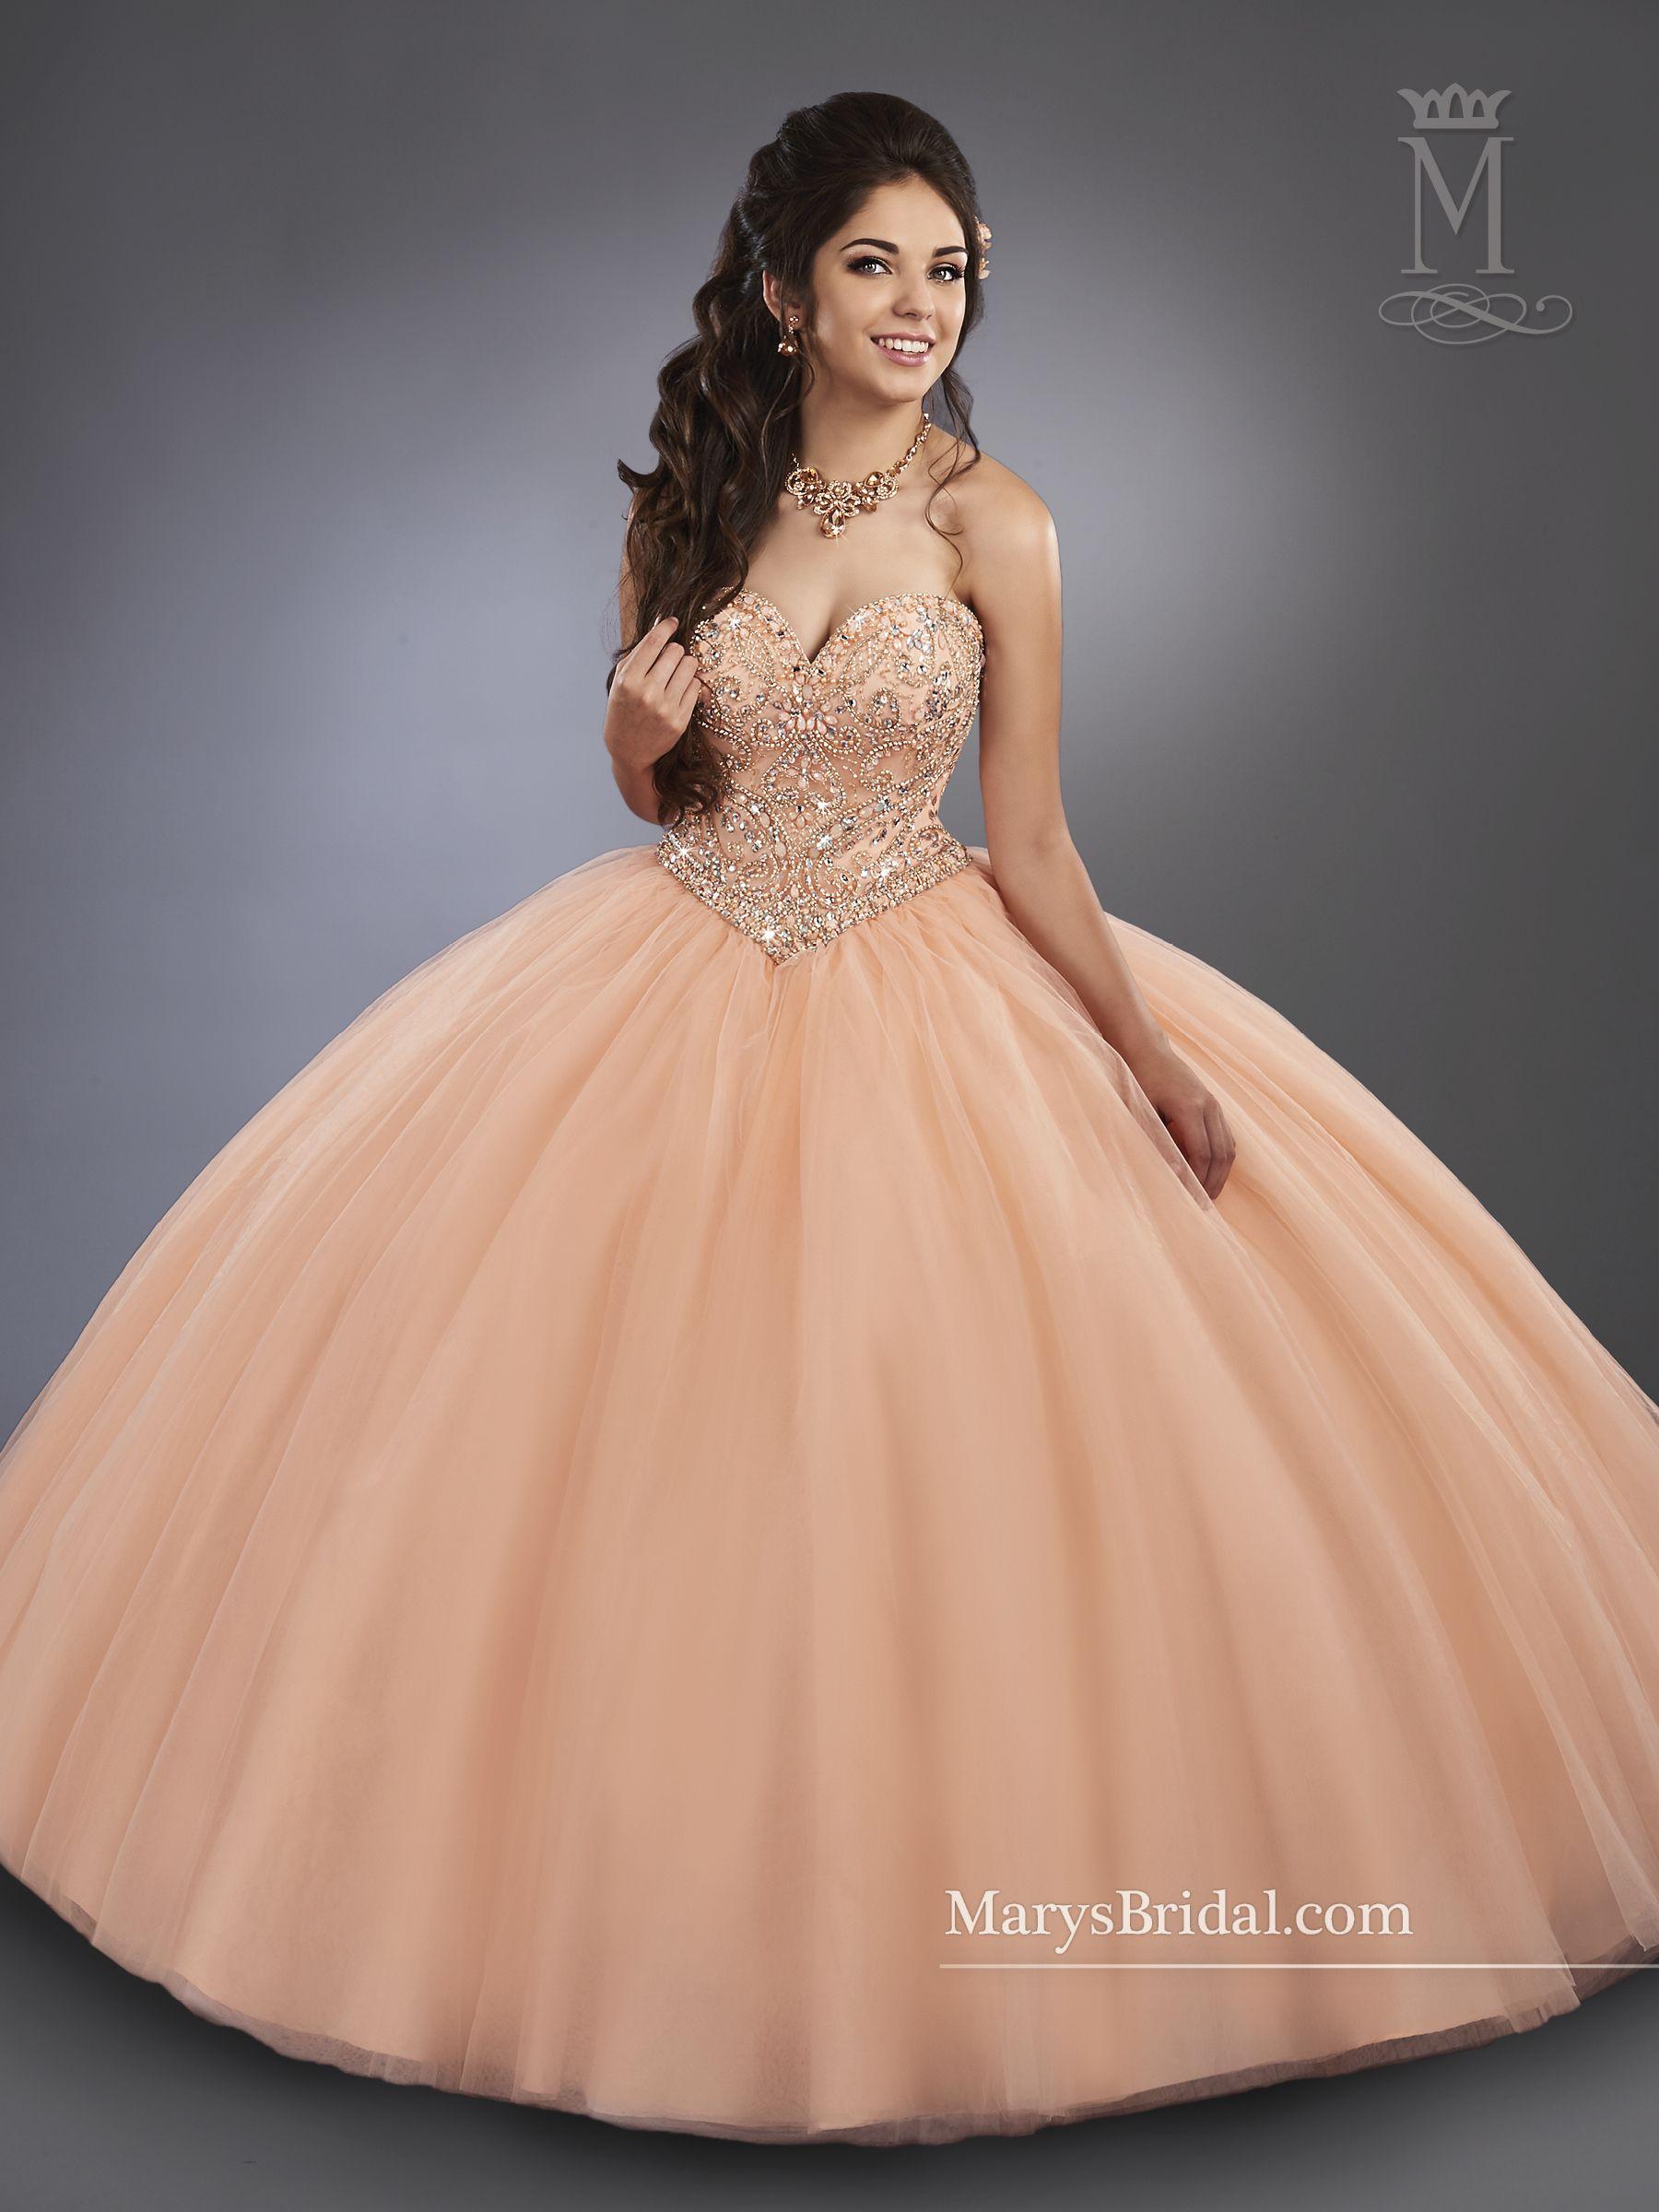 9452ad0d7 Mary s style ID 4774. Mary s style ID 4774 Vestidos De 15 ...